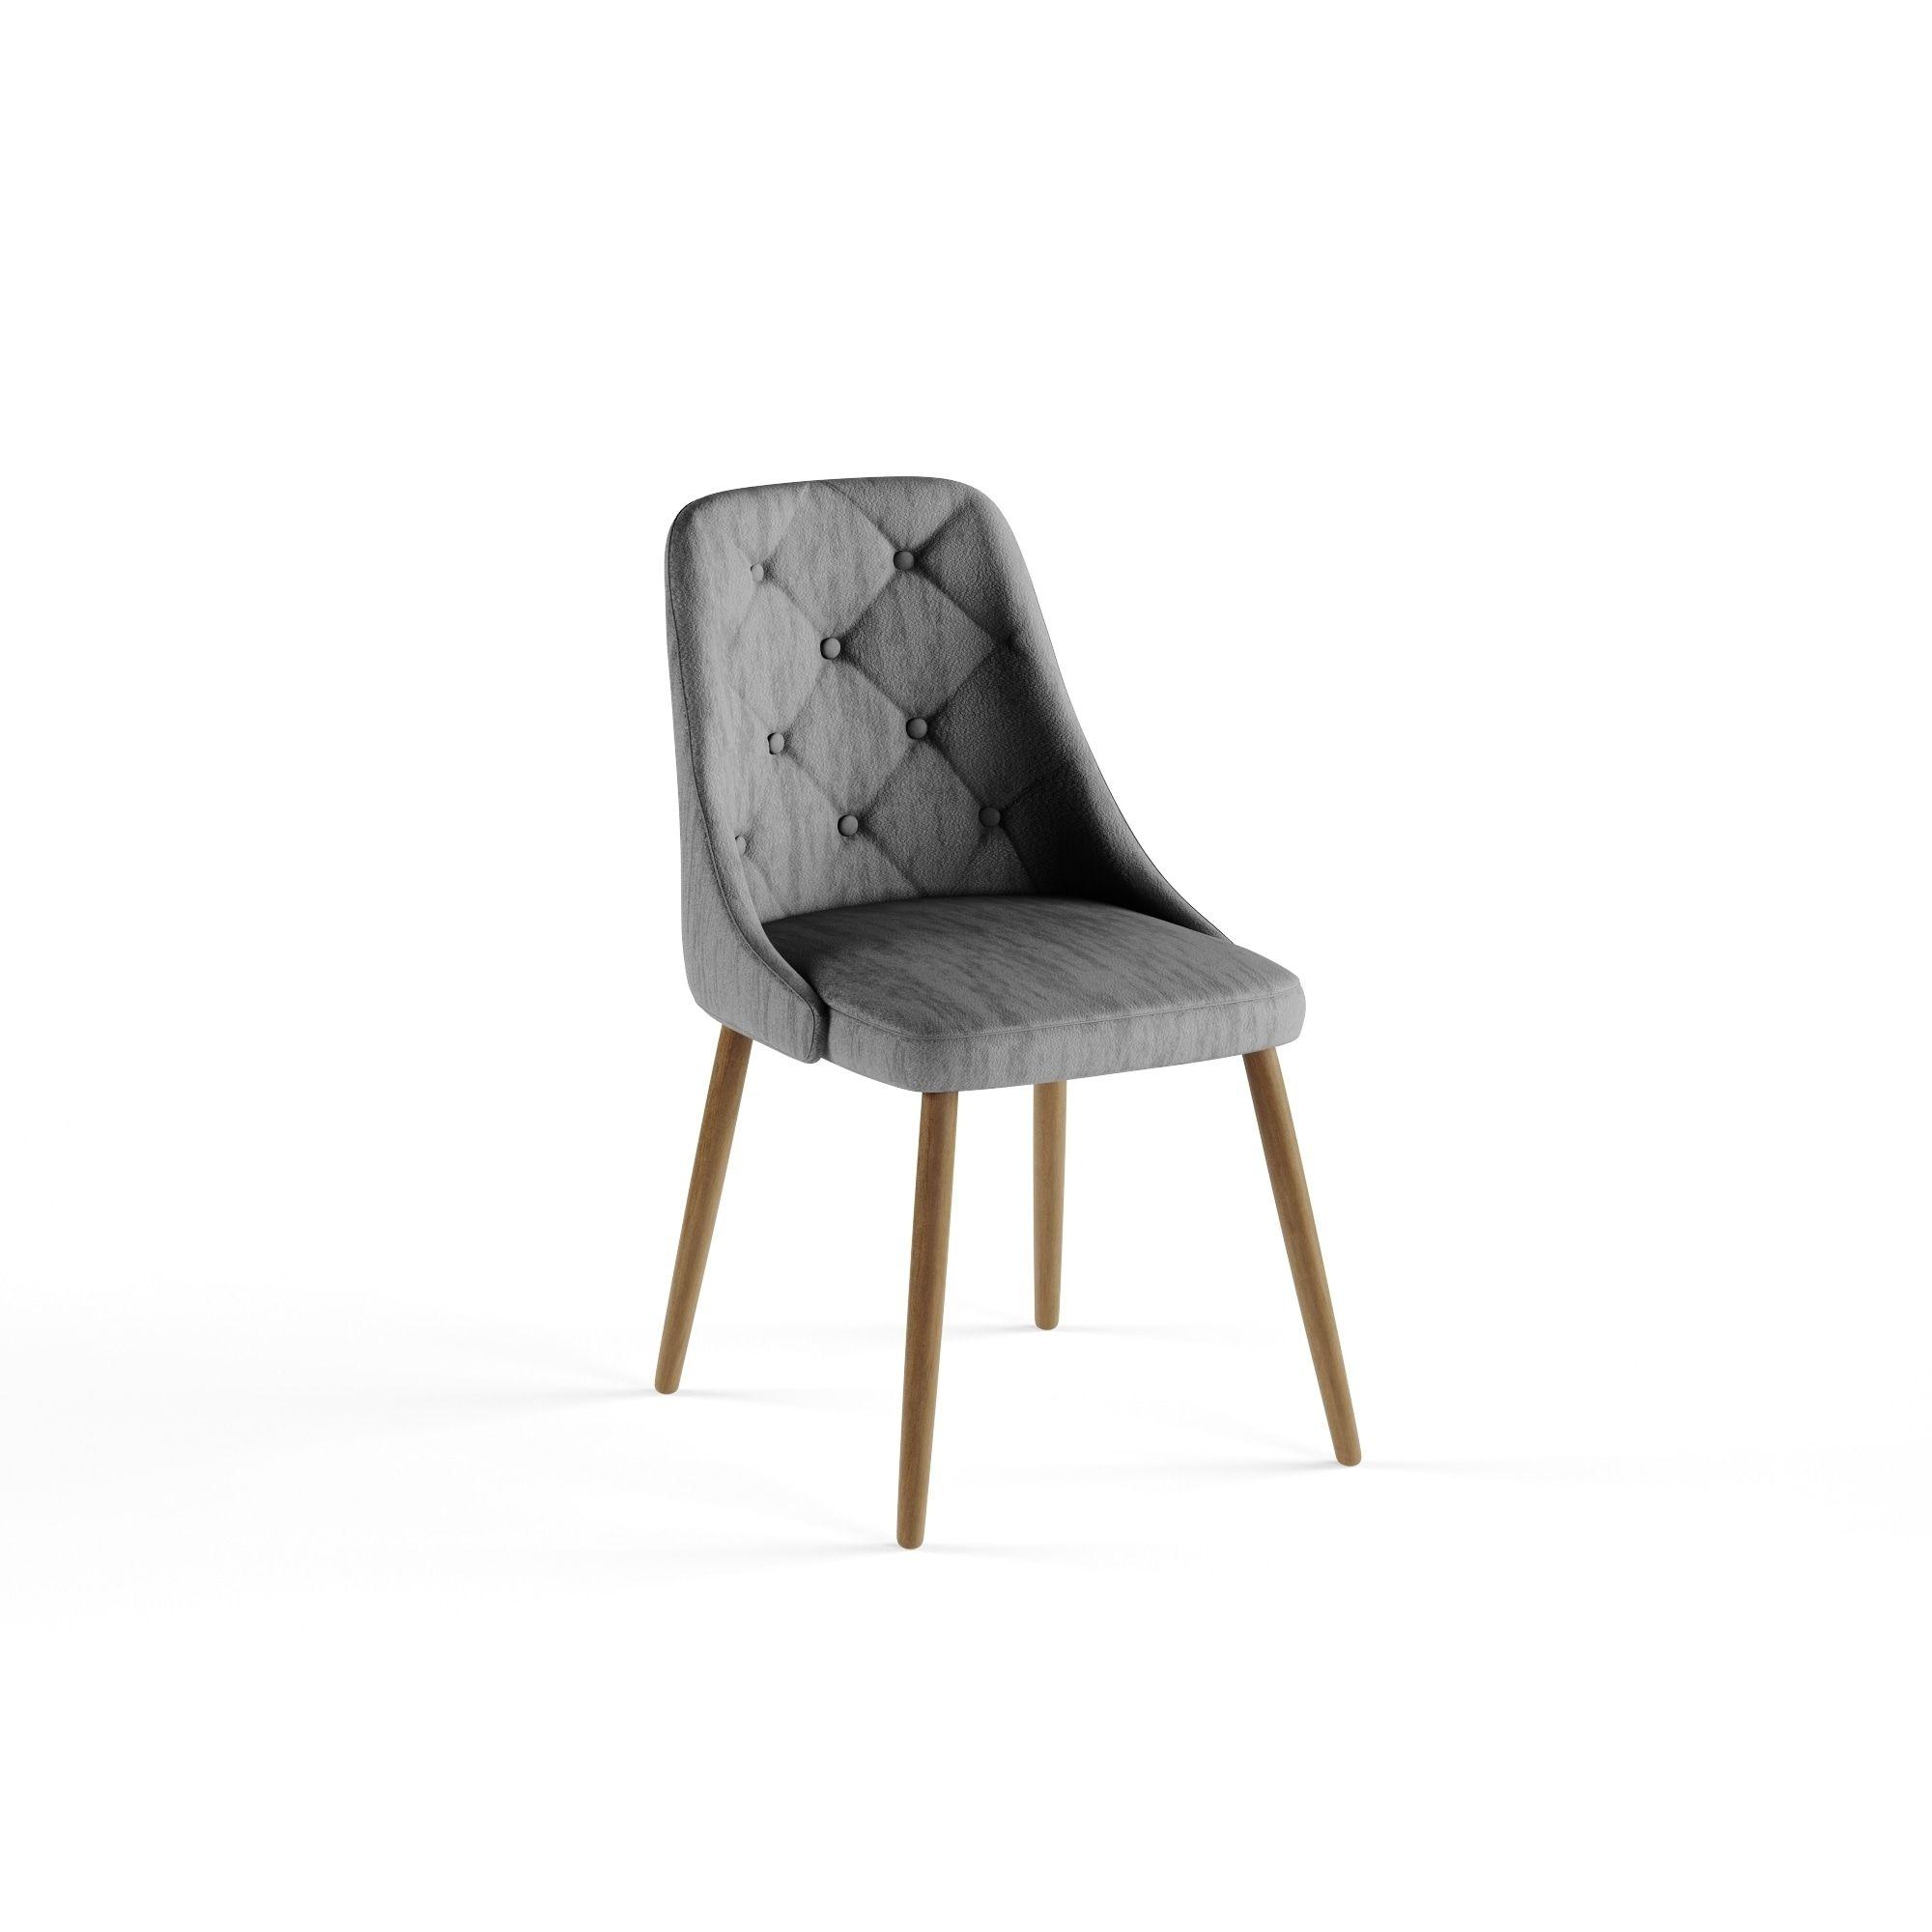 a8c2c78661225 Carson Carrington LumiSource Giovanni Tufted Mid-Century Modern Dining Accent  Chair (